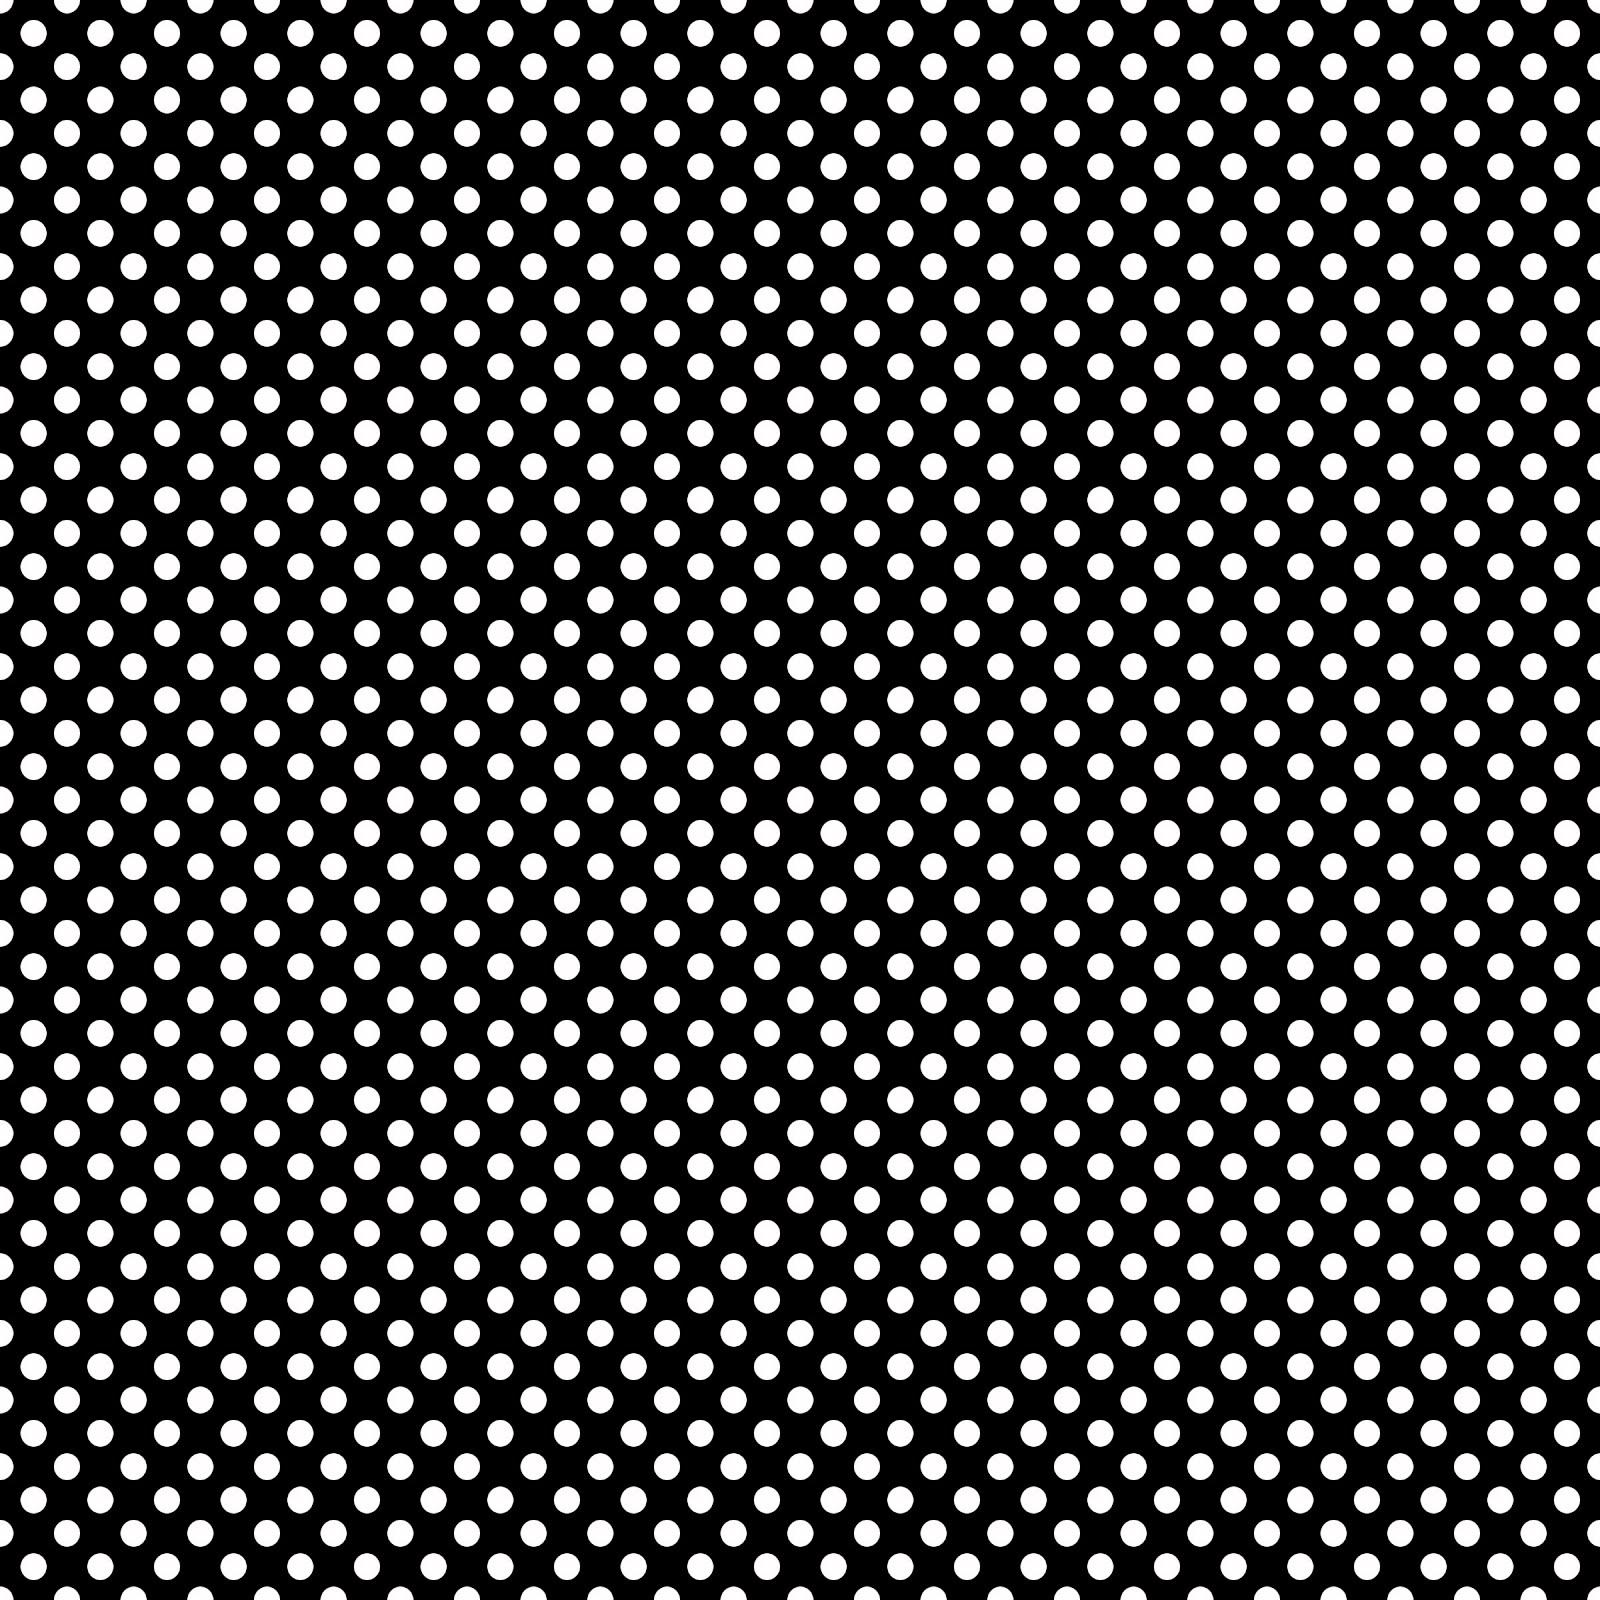 Black Pink Windows Wallpaper: Black And White Dot Wallpaper